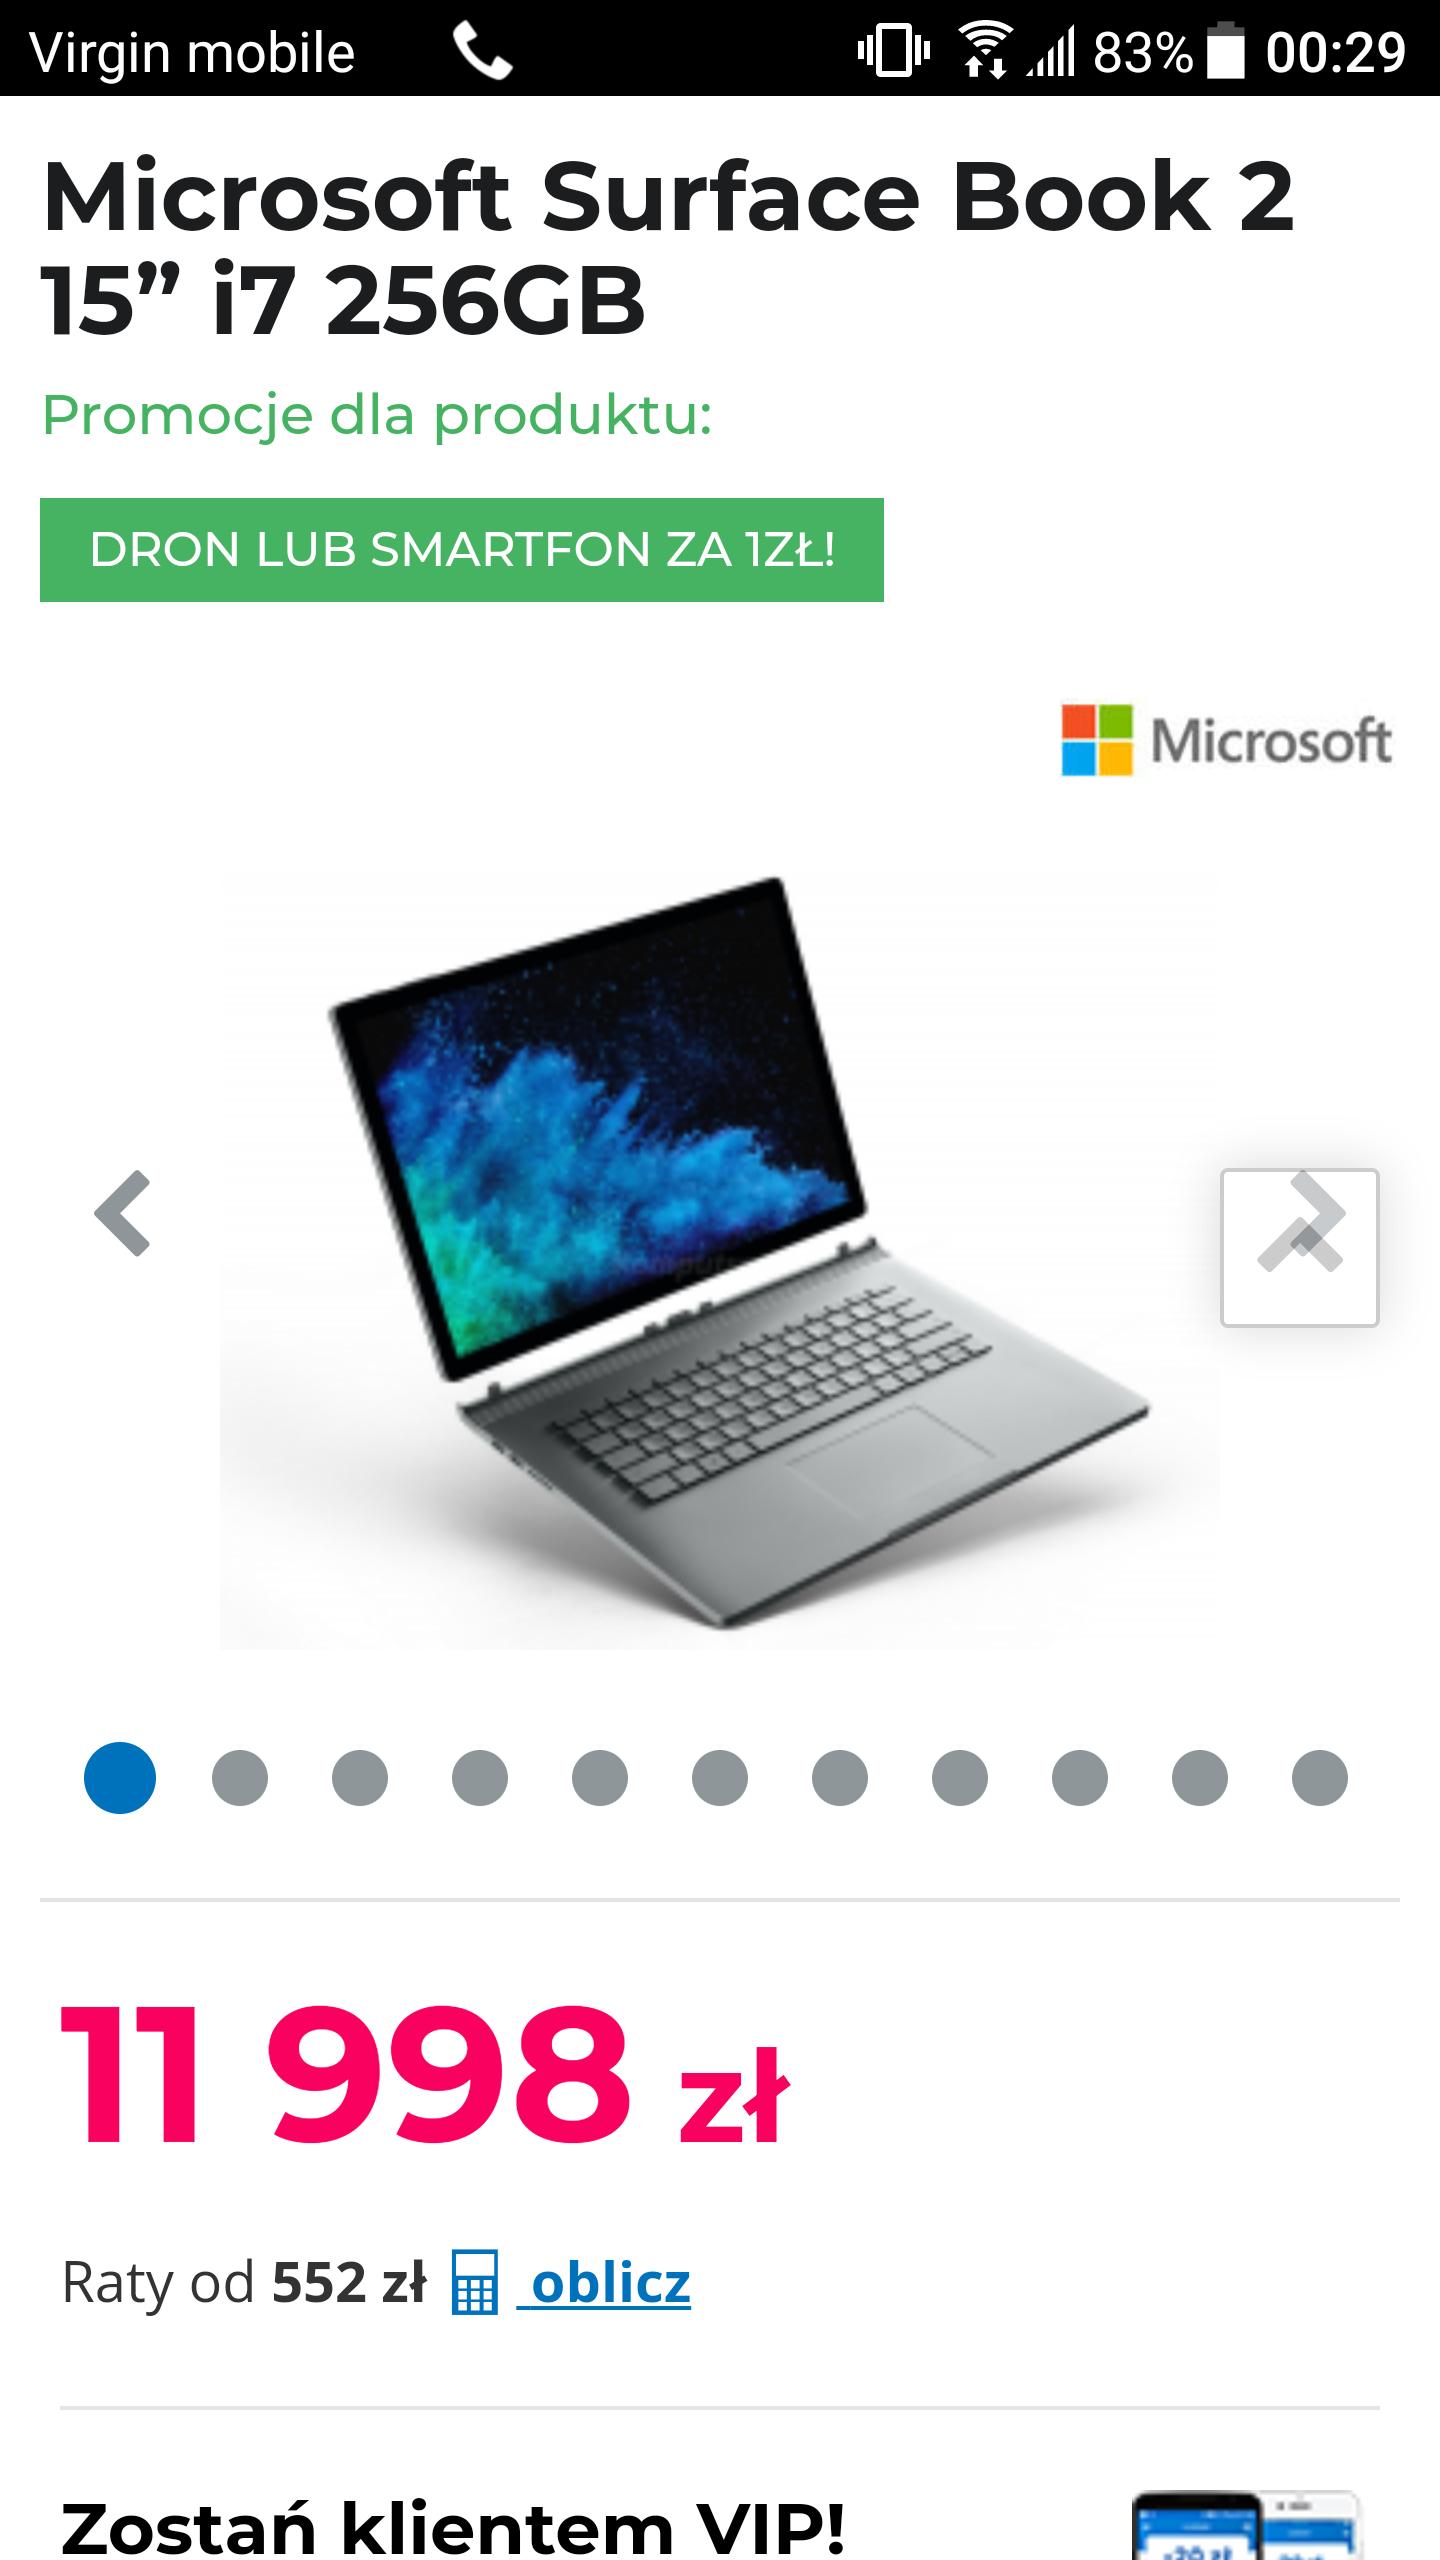 Dji spark/galaxy s8 64 GB do Surface book 2 w komputronik